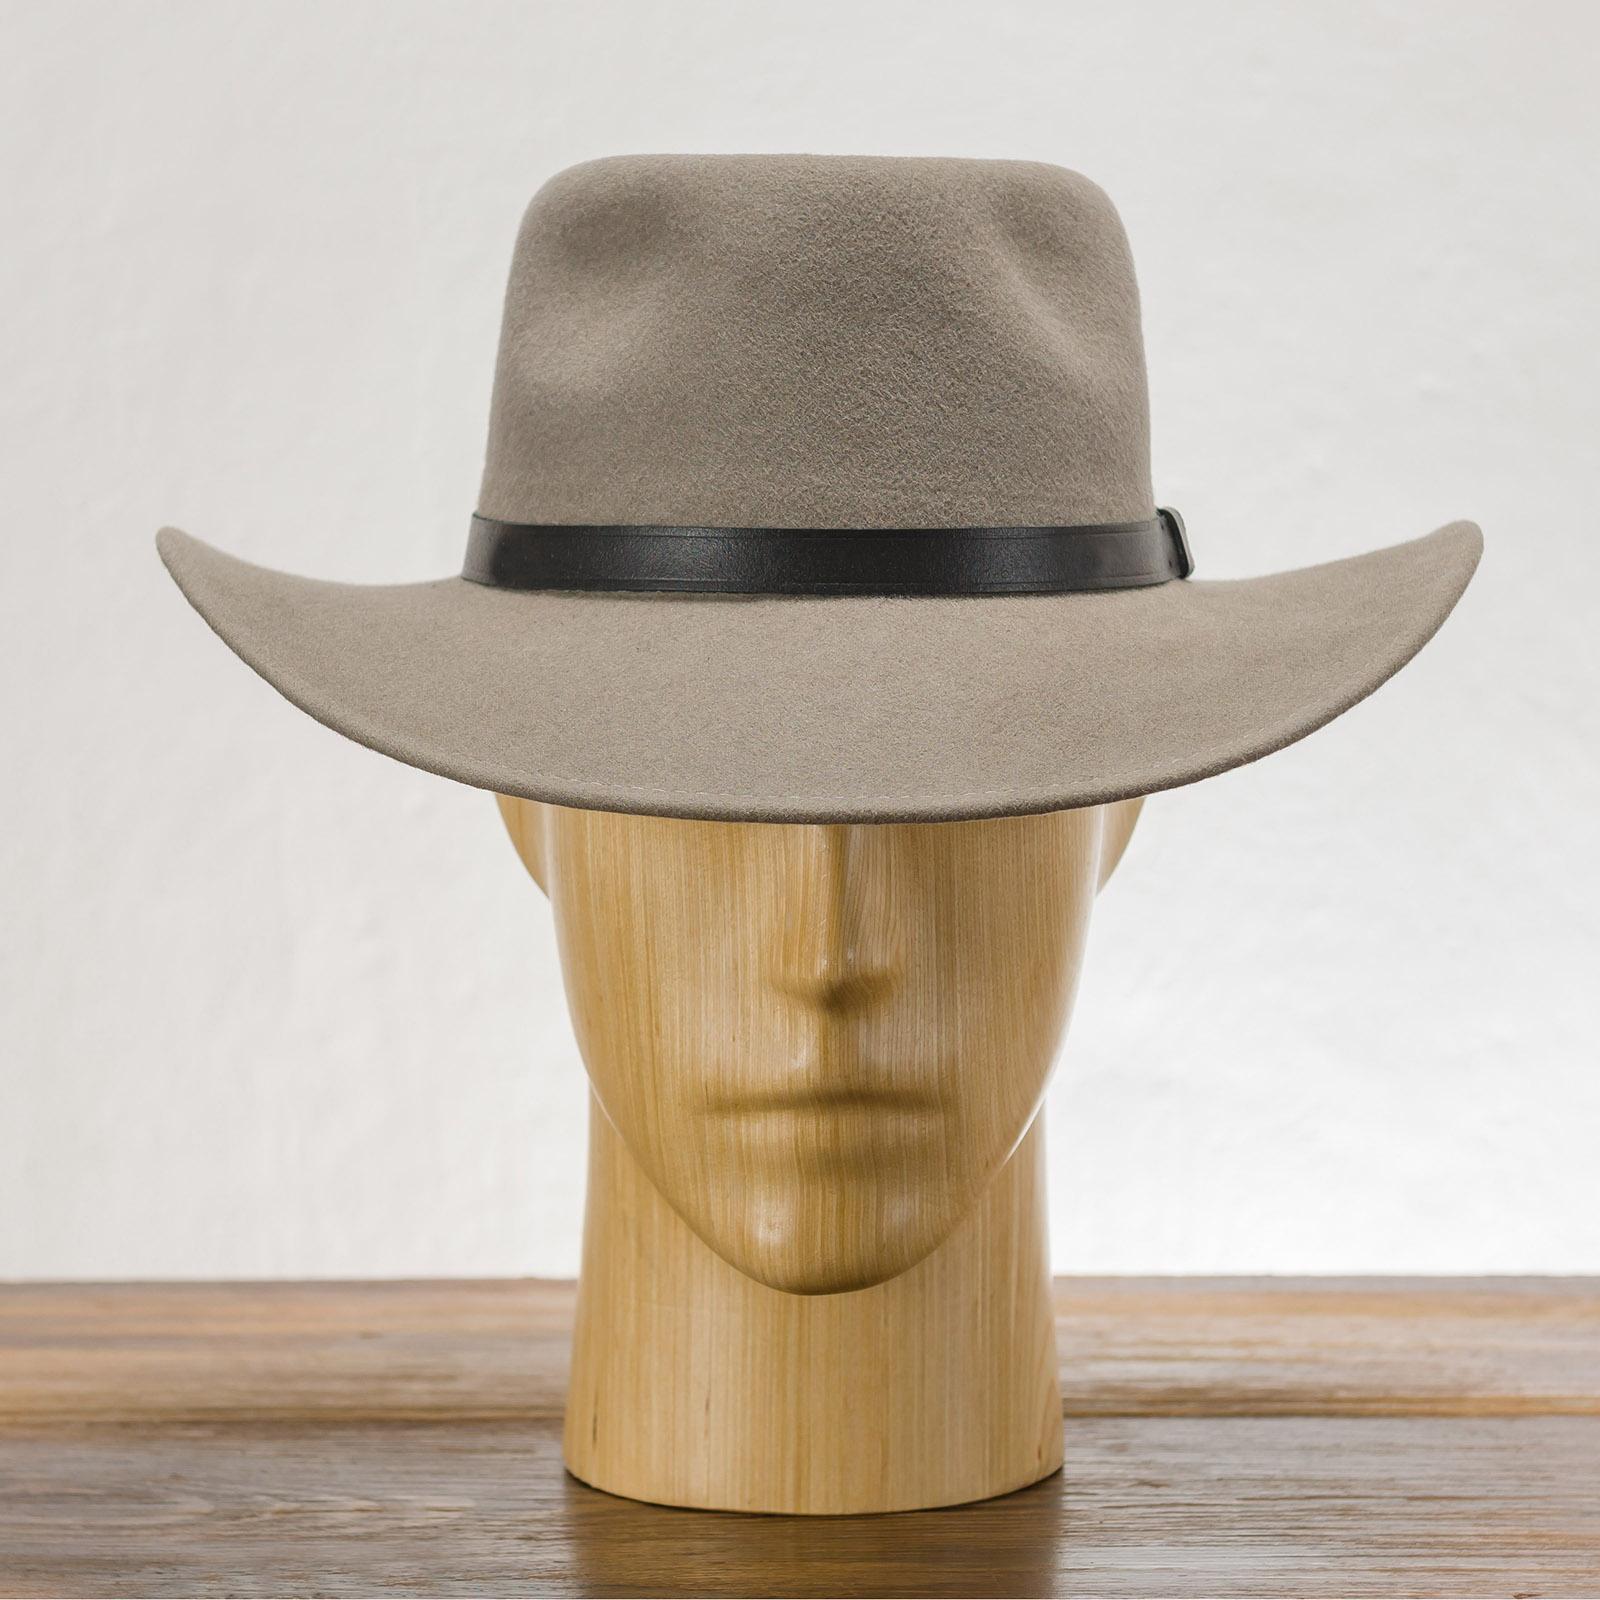 Wool felt teardrop top large brim fedora hat classic jazz vintage boho mobster gangster dressy trilby cowboy western wide brim